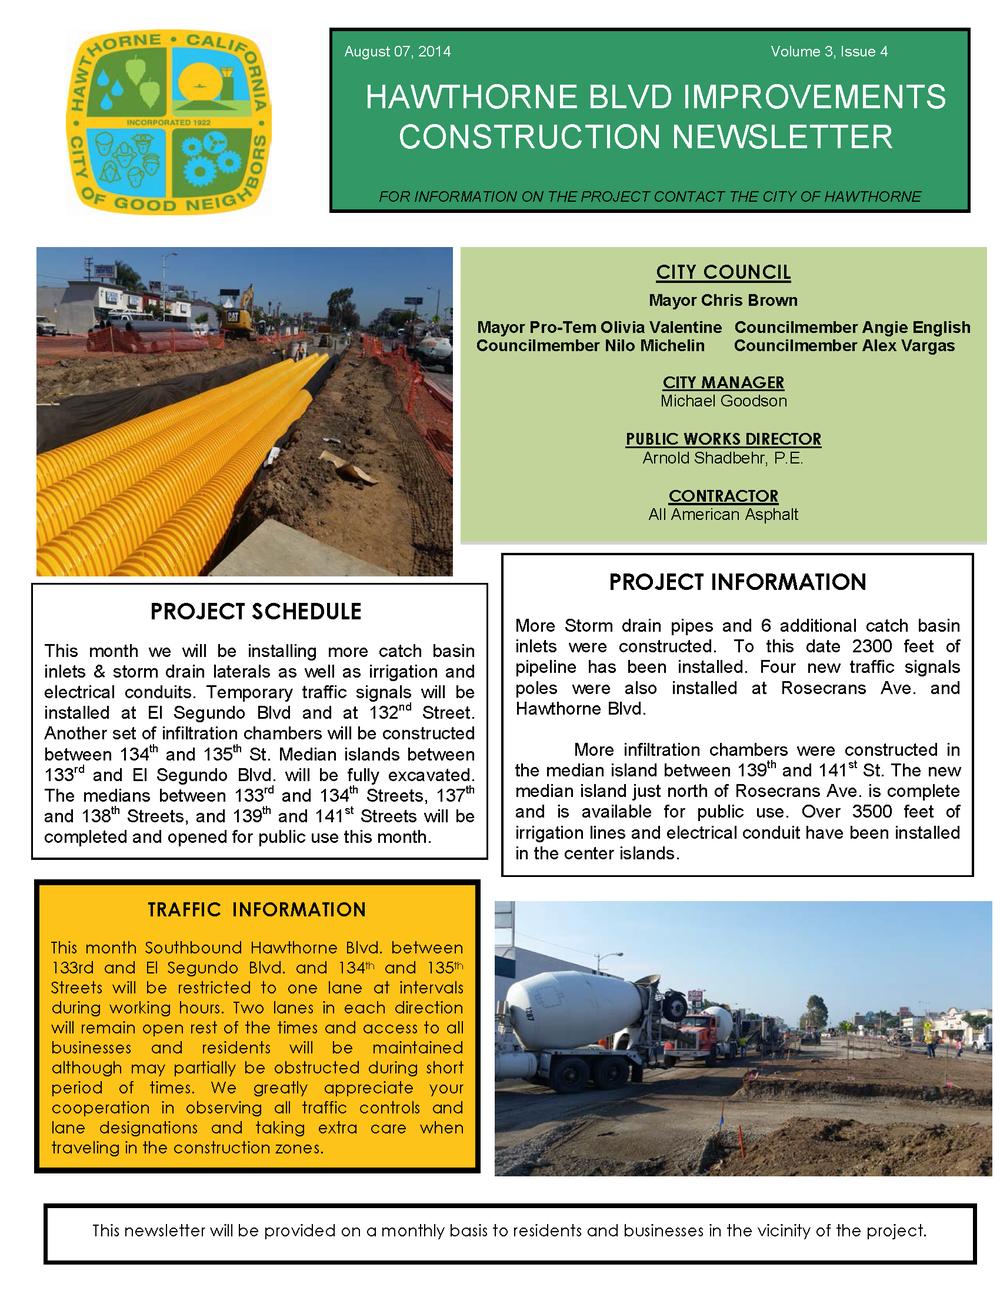 Hawthorne Blvd Improvements Newsletter Aug 2014